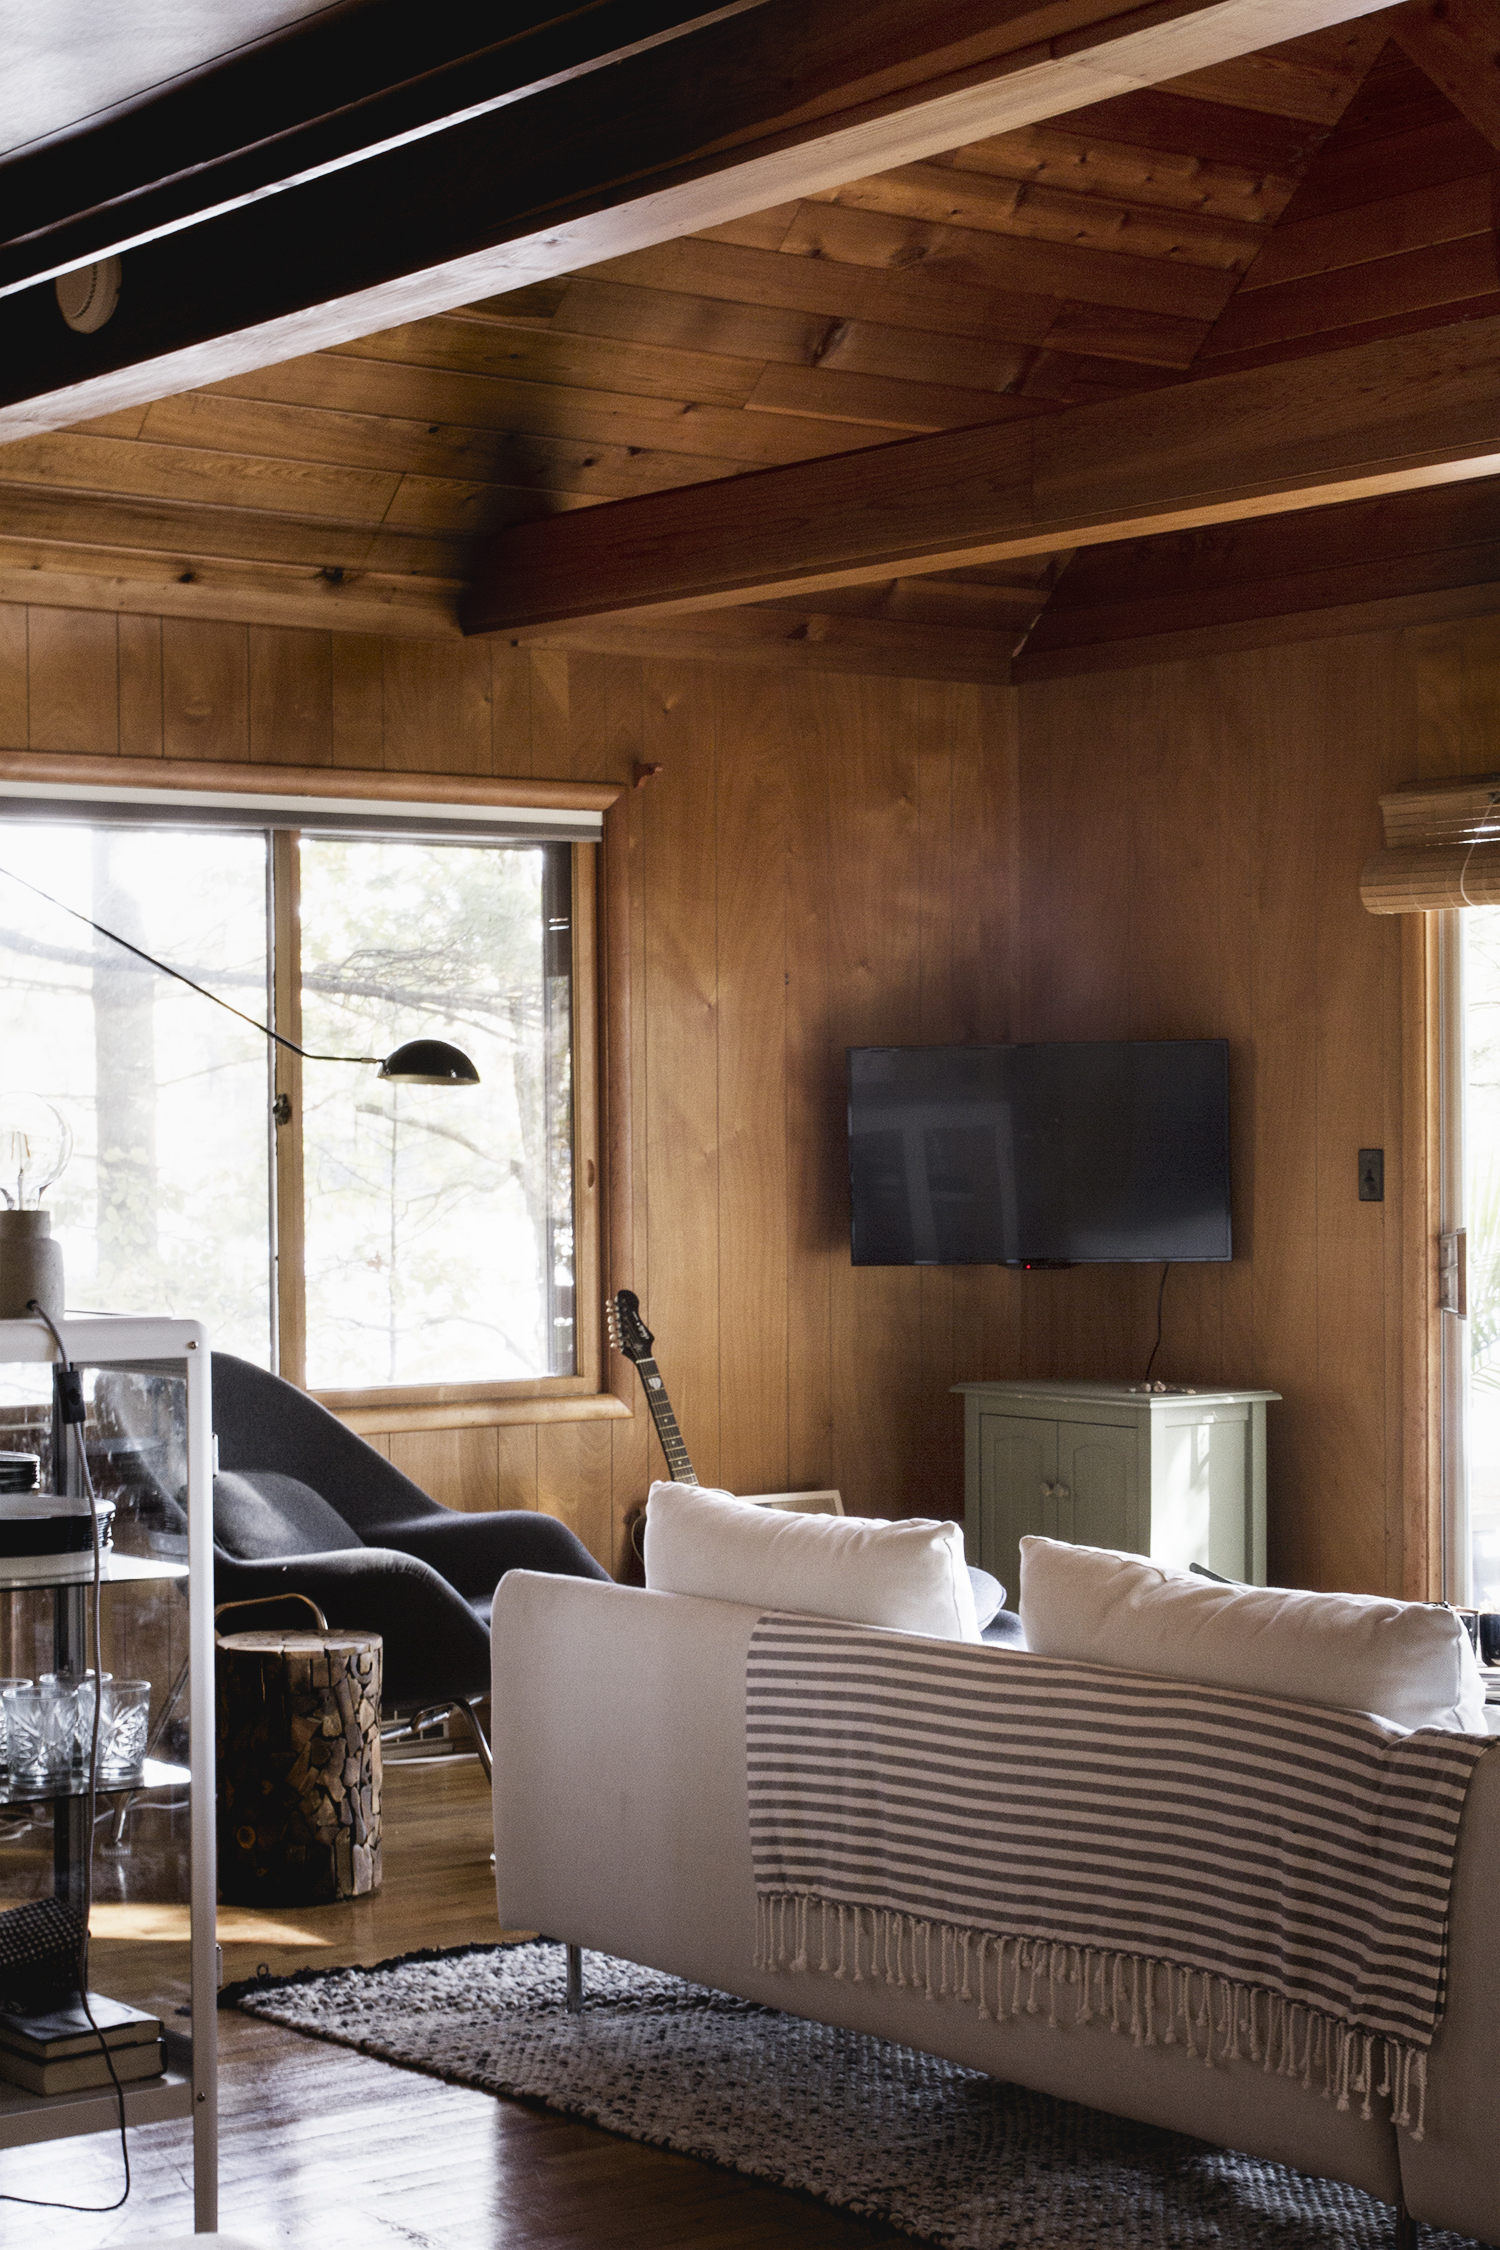 A Wisconsin A-Frame Style Cabin Renovation Story | Deuce Cities Henhouse